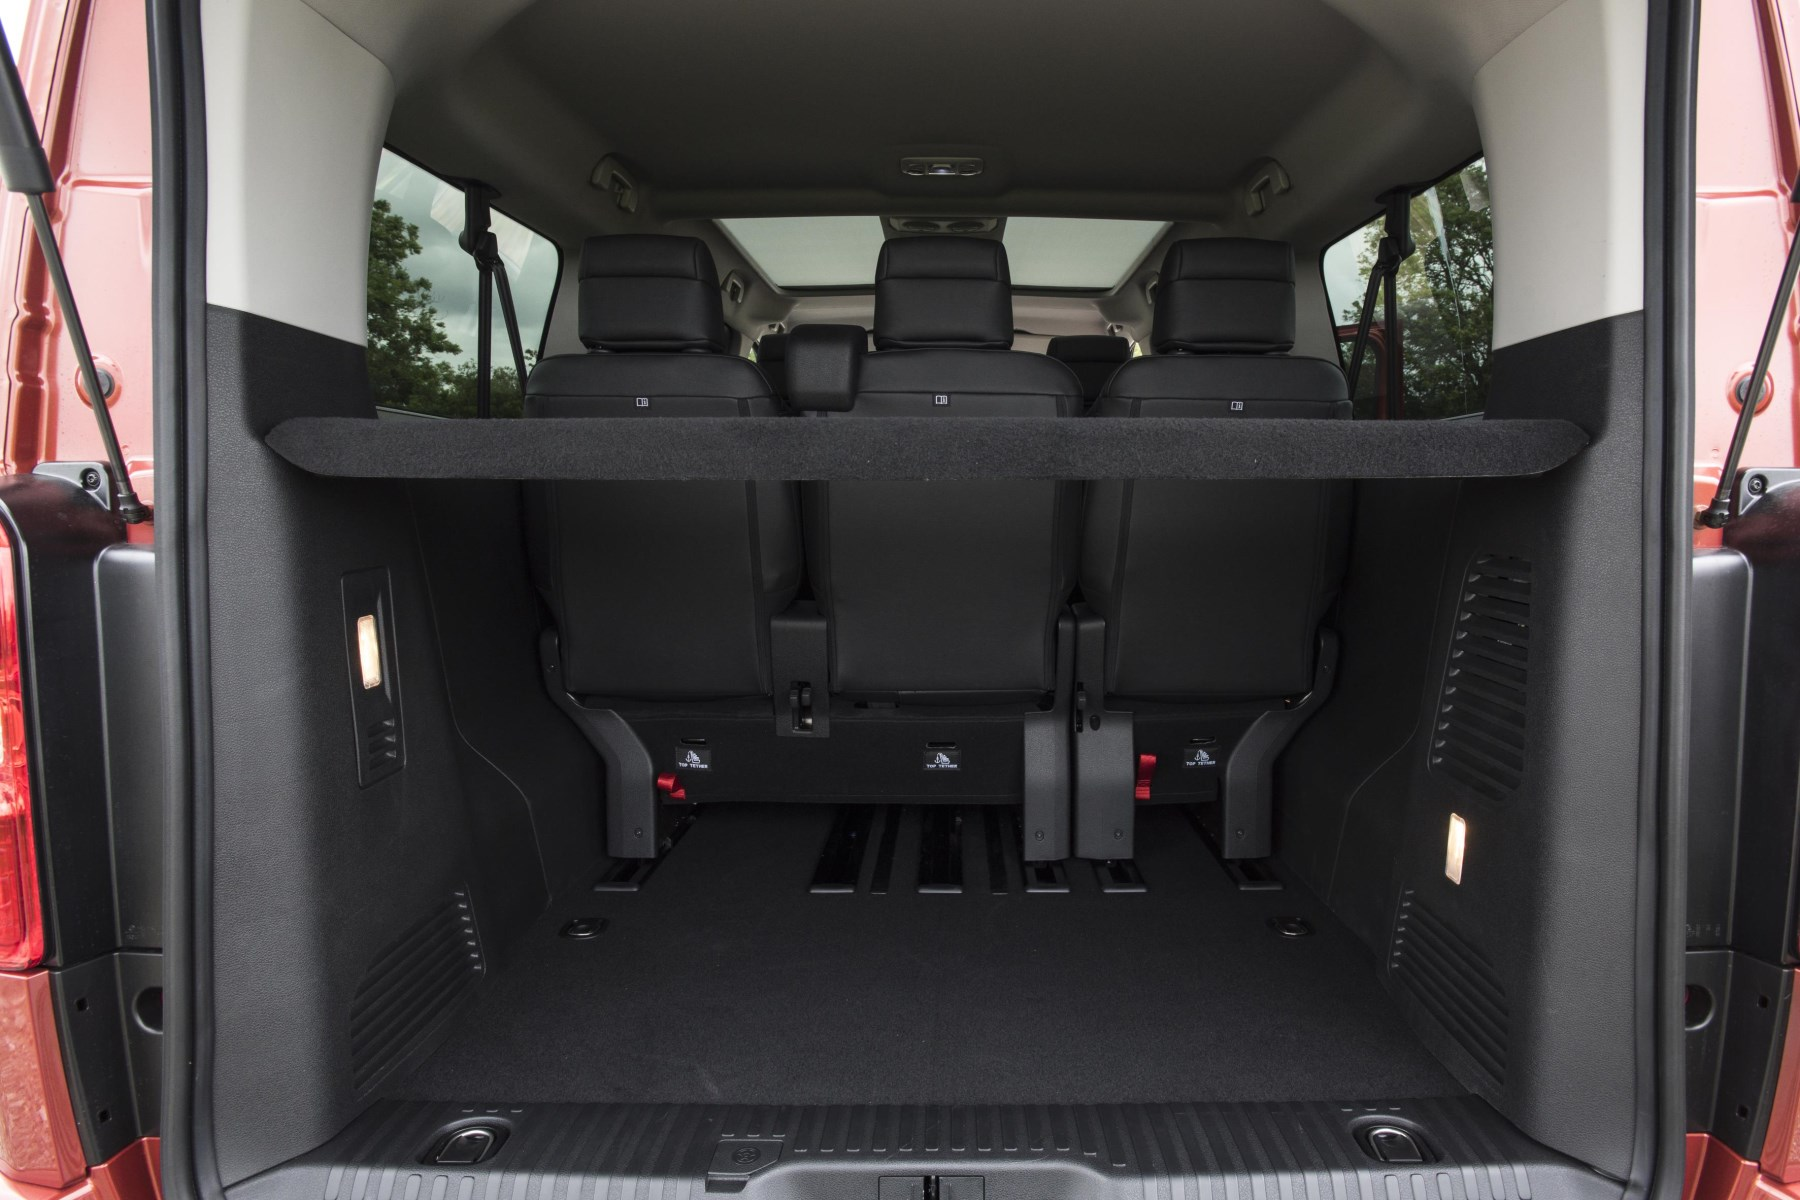 Vauxhall Vivaro Life review